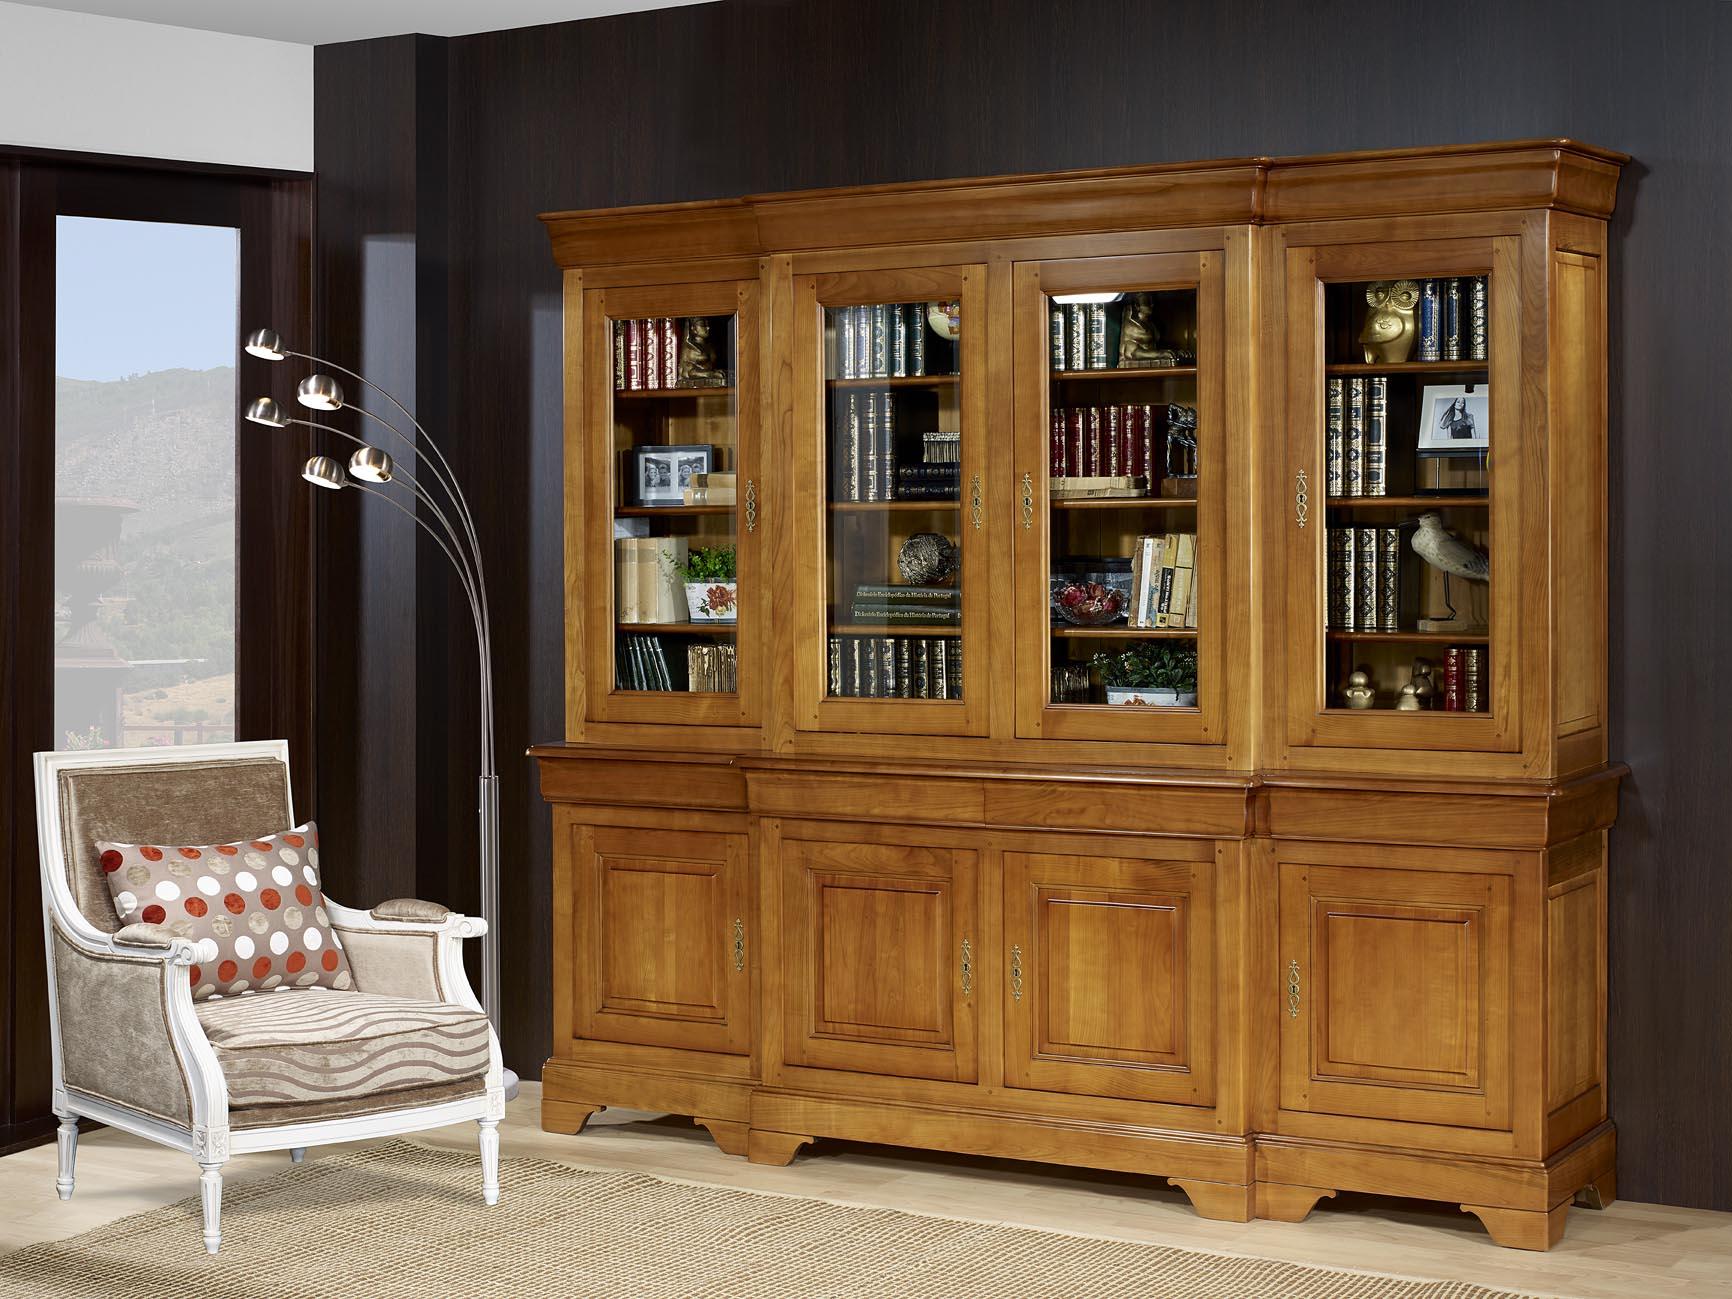 bibliotheque merisier. Black Bedroom Furniture Sets. Home Design Ideas